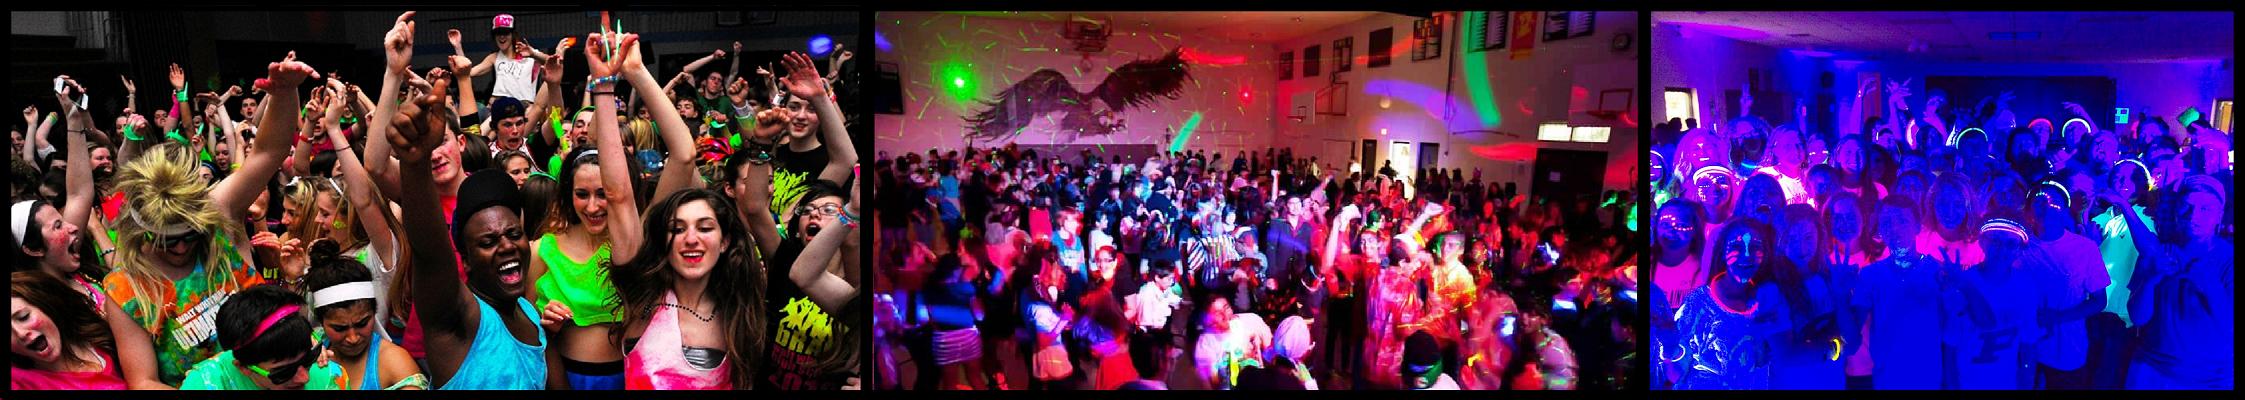 Houston DJ, DJs in Houston, Houston Prom, High School Senior Prom, Homecoming, Dance, Senior Class, School Dance, Banquet, Sonido DJ Sammy De Houston, Awesome Music Entertainment, Awesome Event Pros, AME DJs